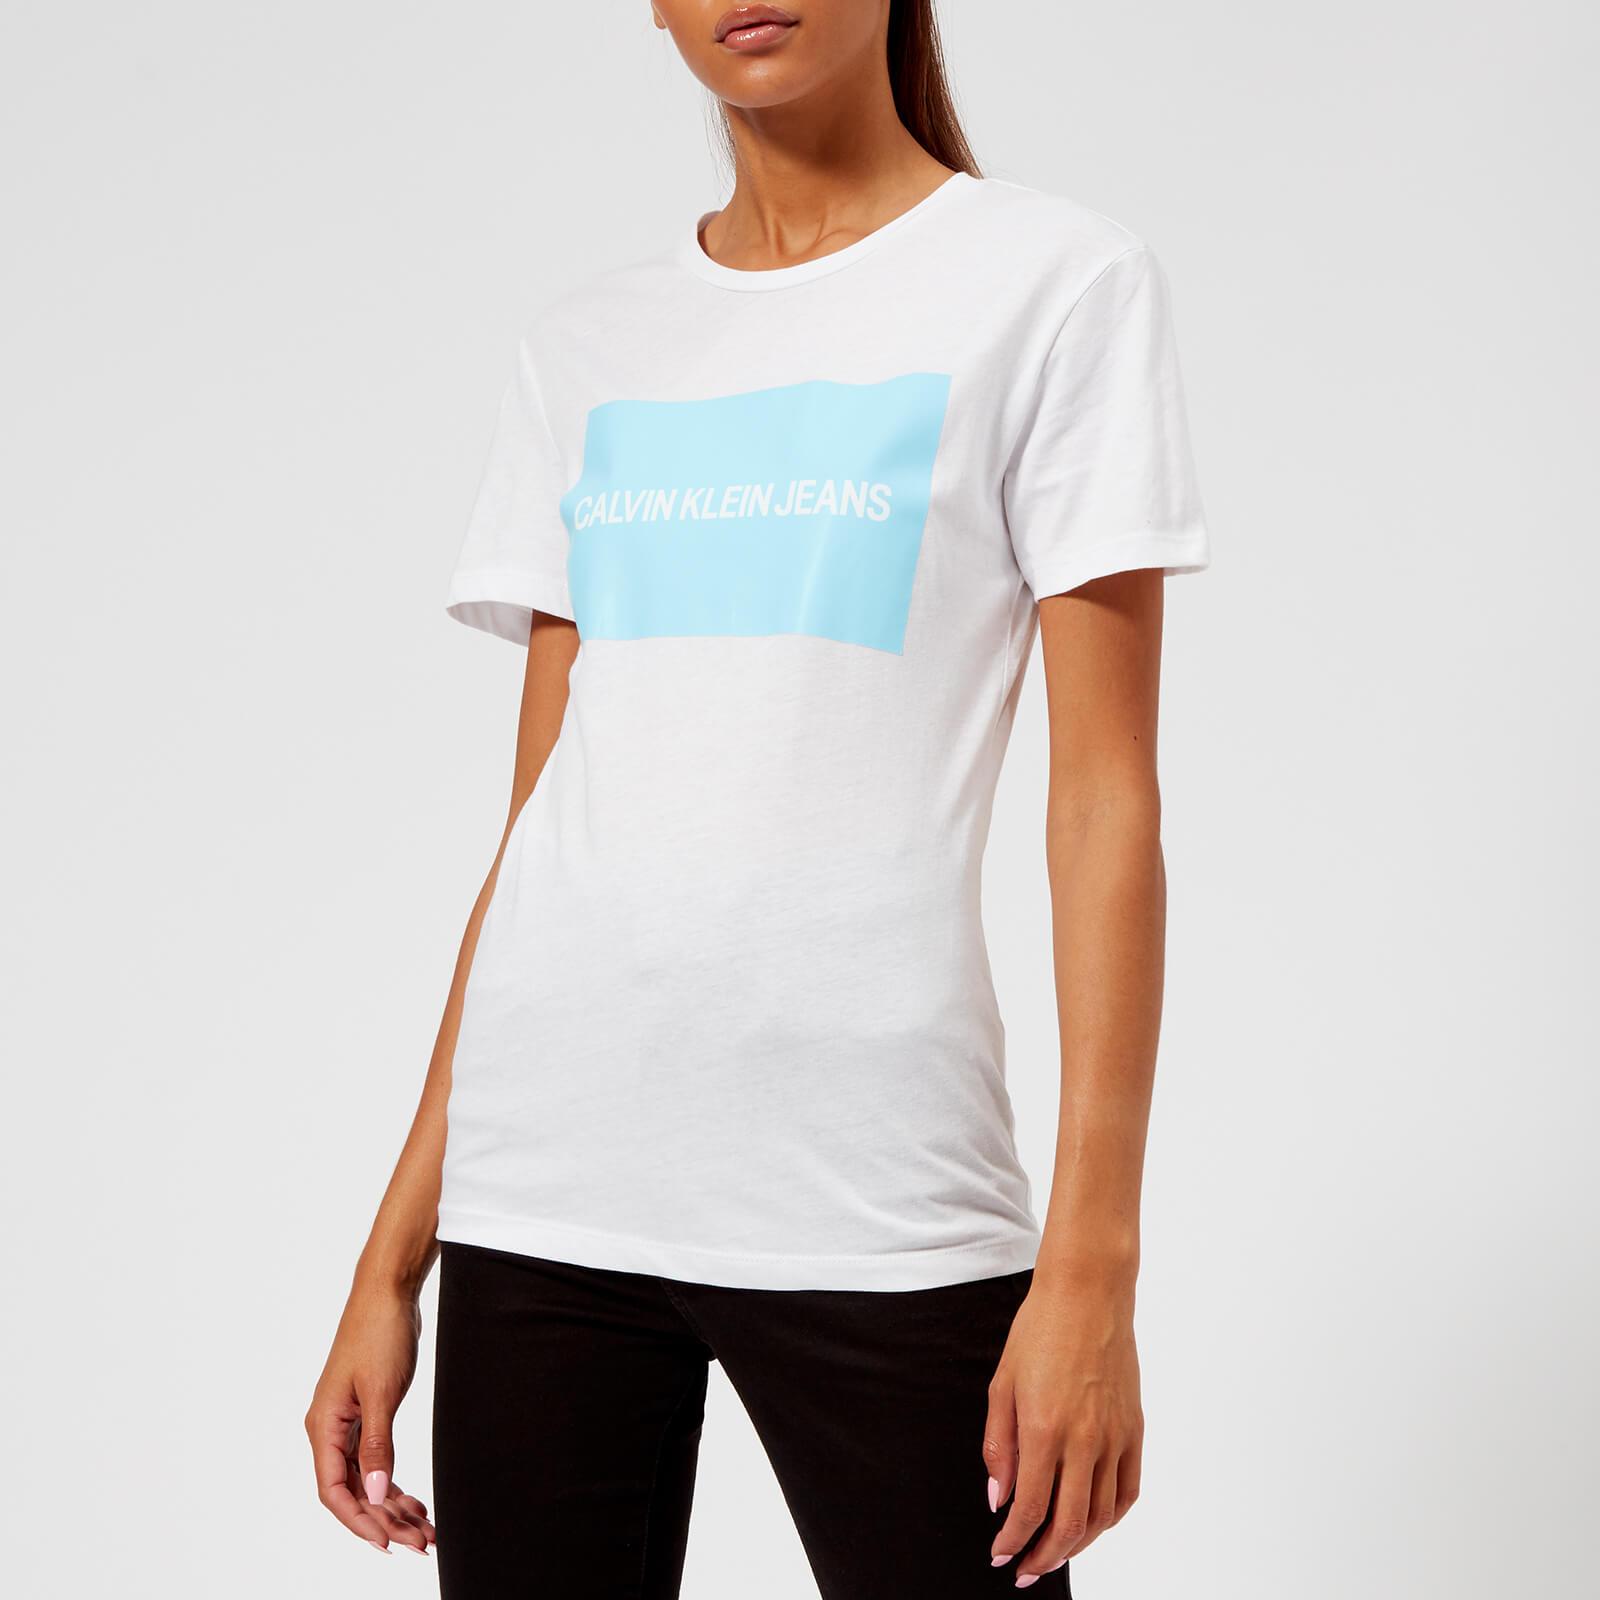 8b209ea977d4 Calvin Klein Jeans Women's Institutional Box Logo T-Shirt - Bright  White/Sky Blue Womens Clothing | TheHut.com